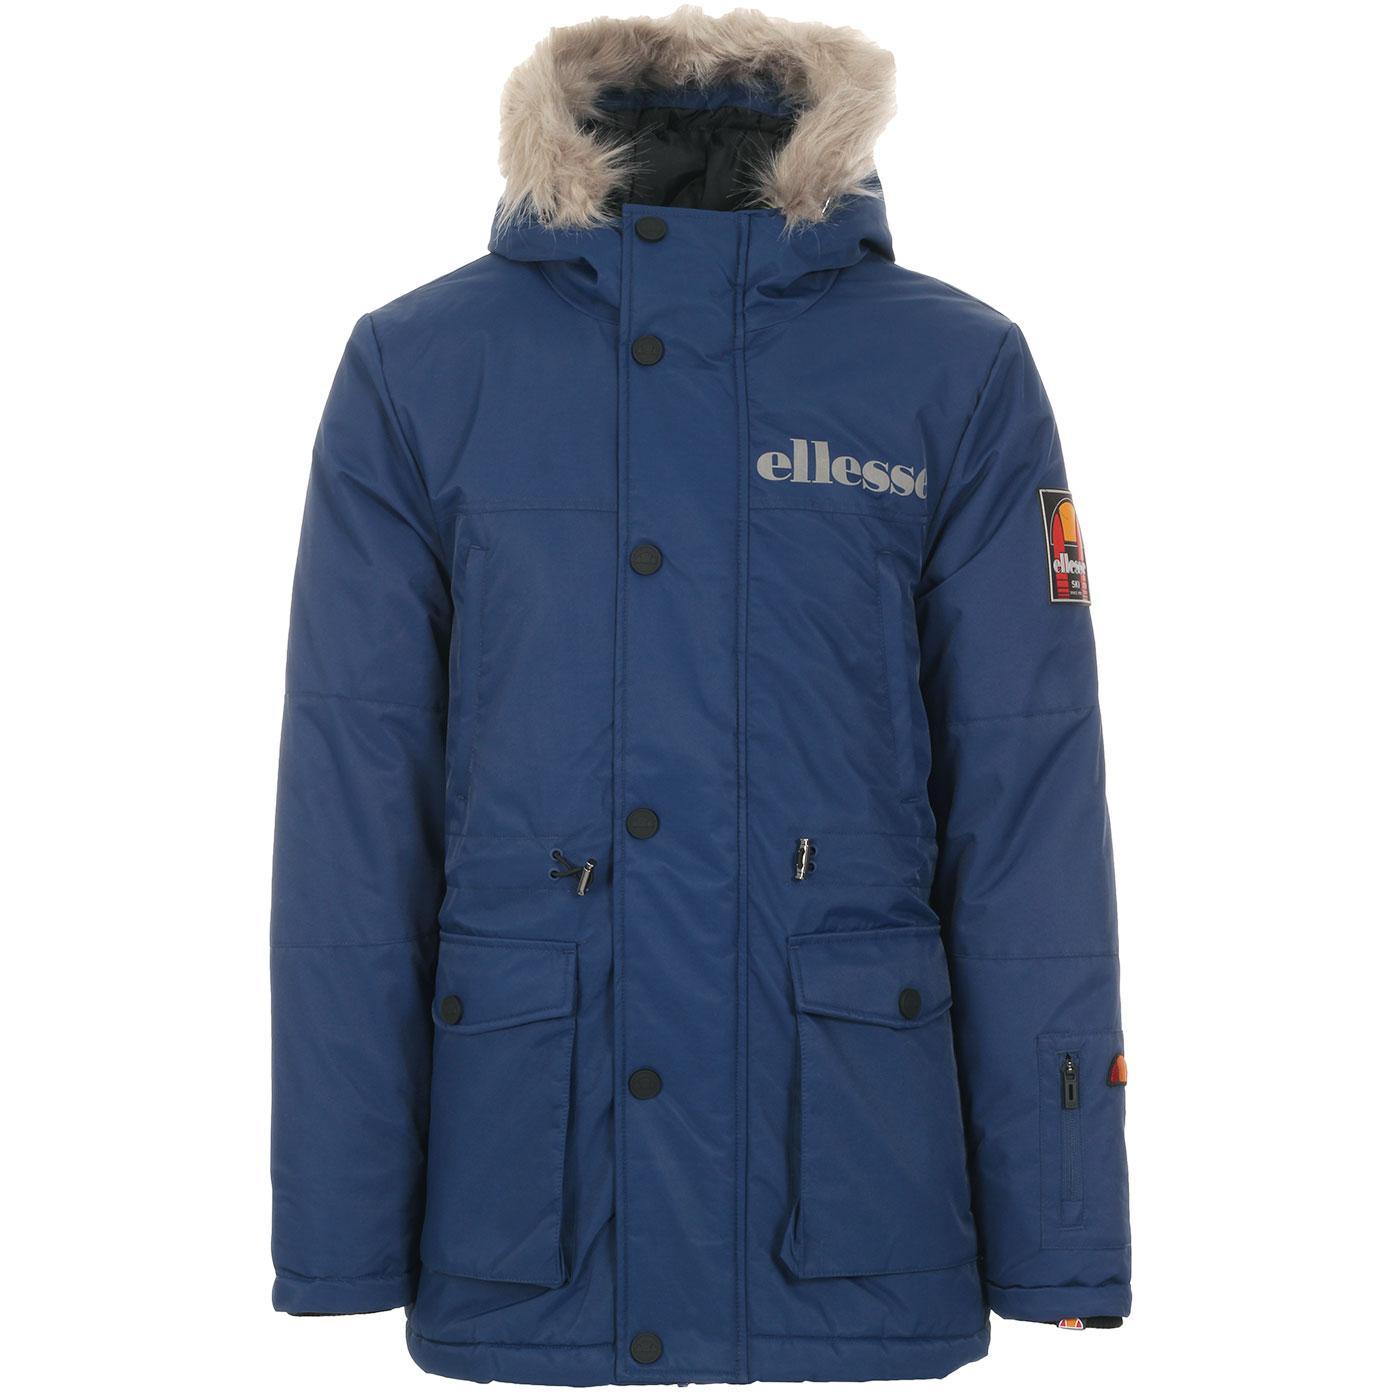 Mazzo ELLESSE Retro 90s Snorkel Parka Jacket (N)